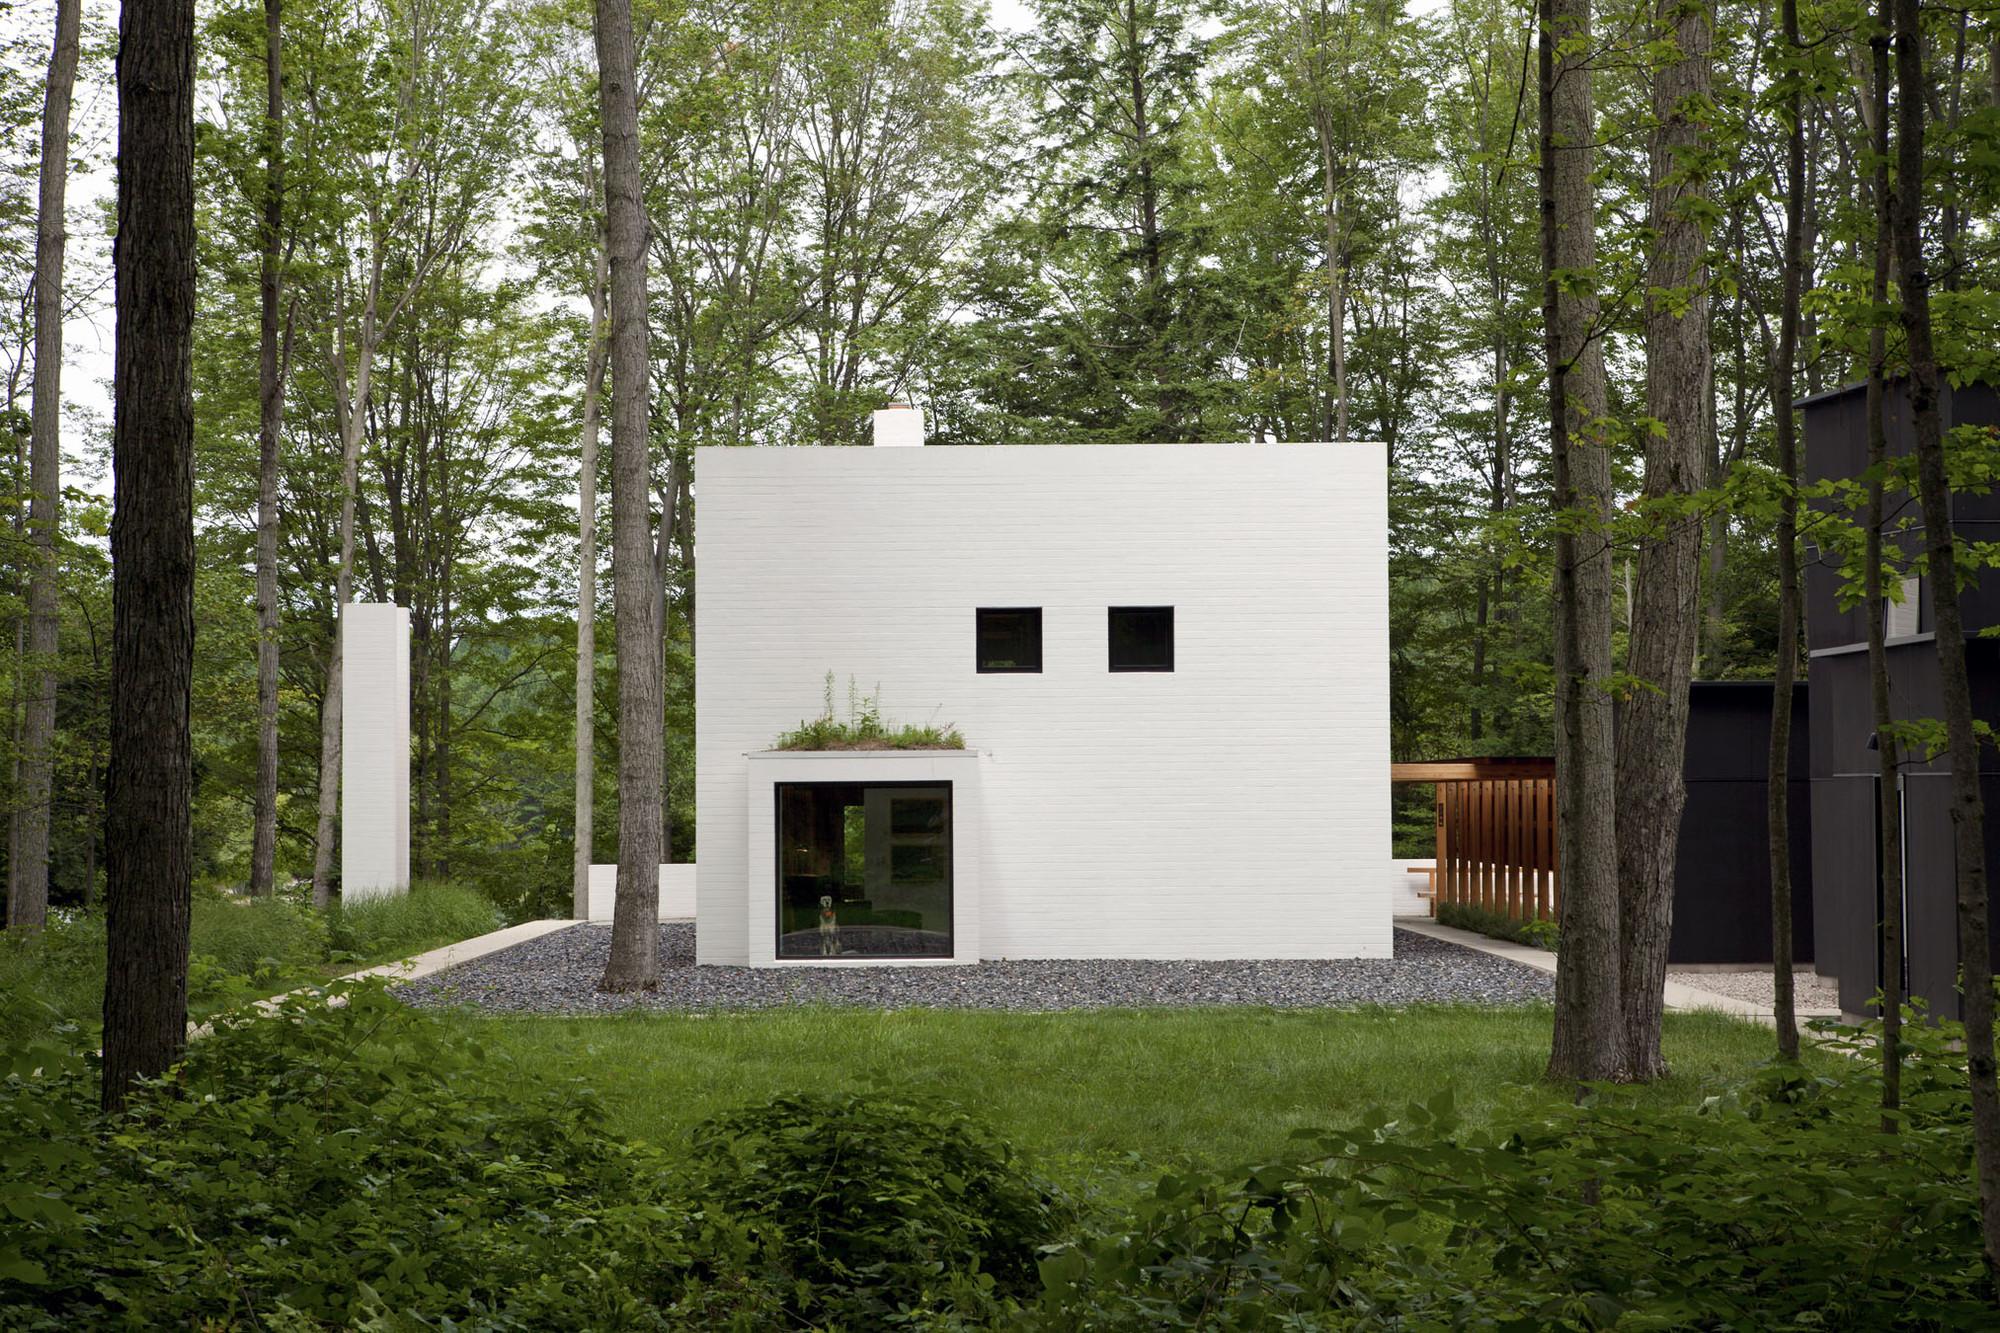 Yingst Retreat / Salmela Architect